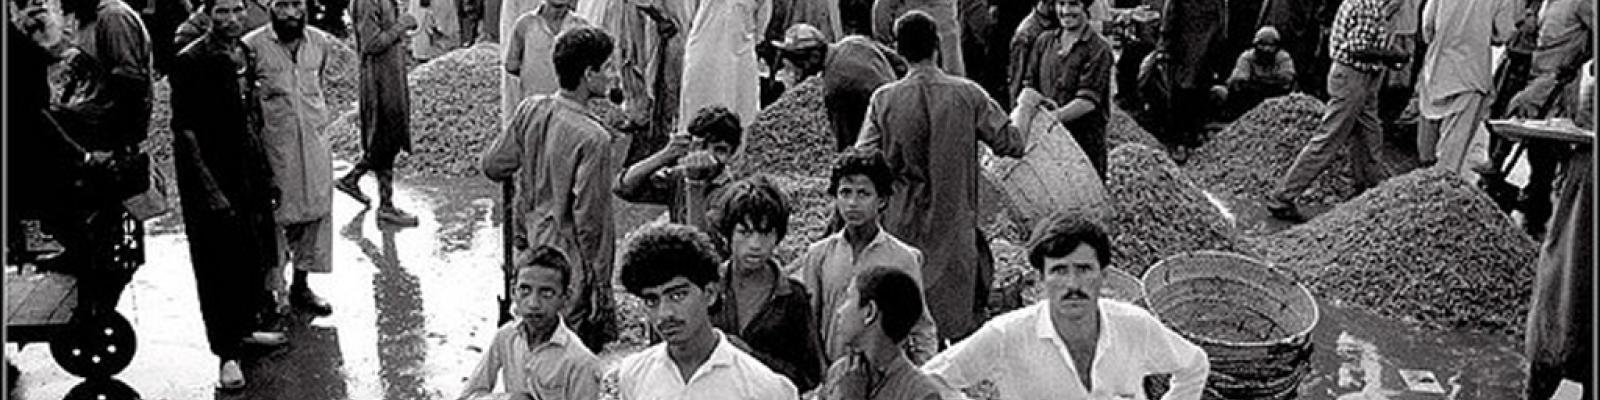 Sehgal on Karzai's Visit to Pakistan